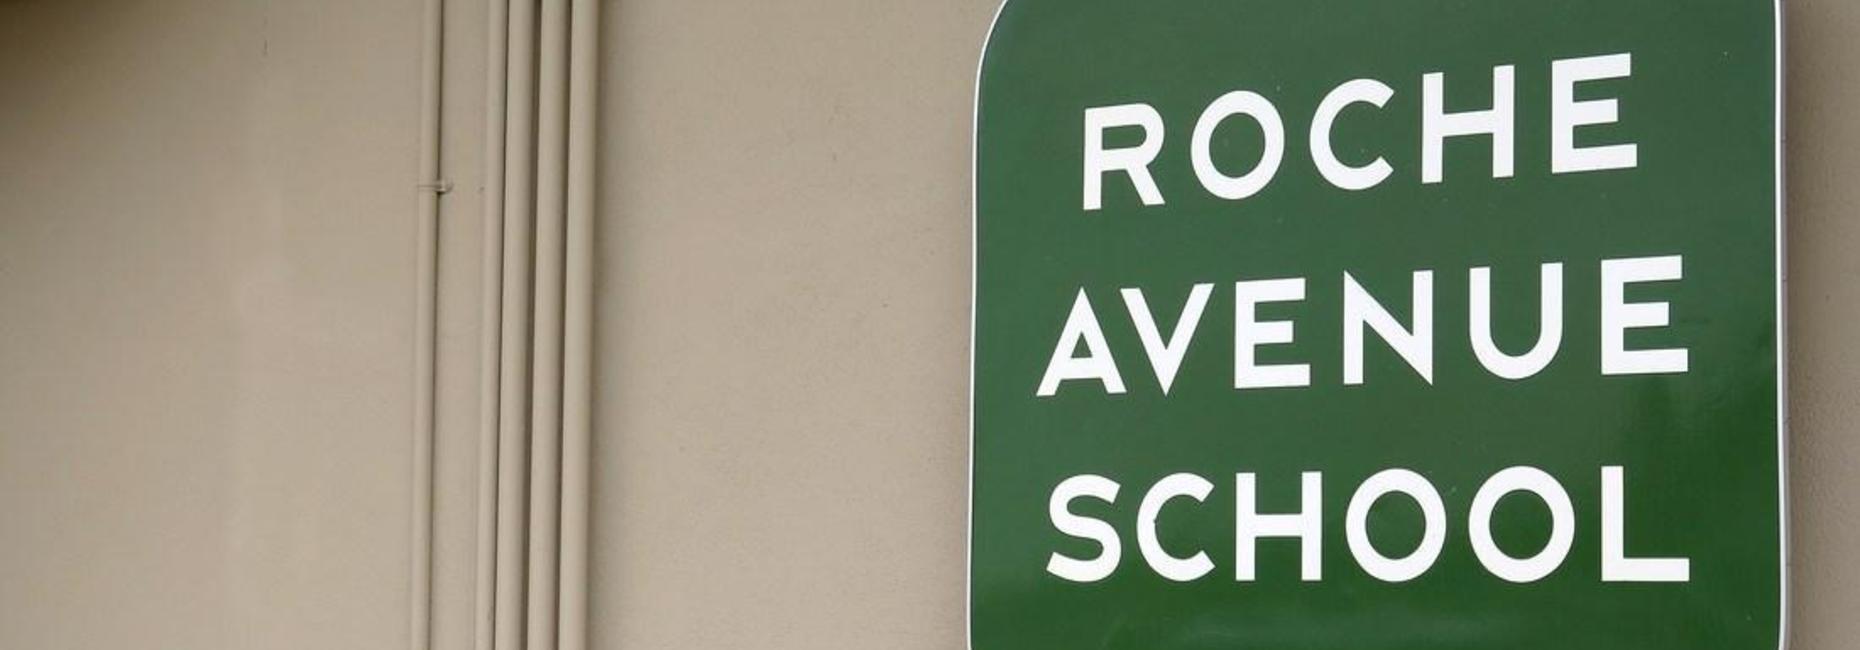 Roche Avenue Elementary